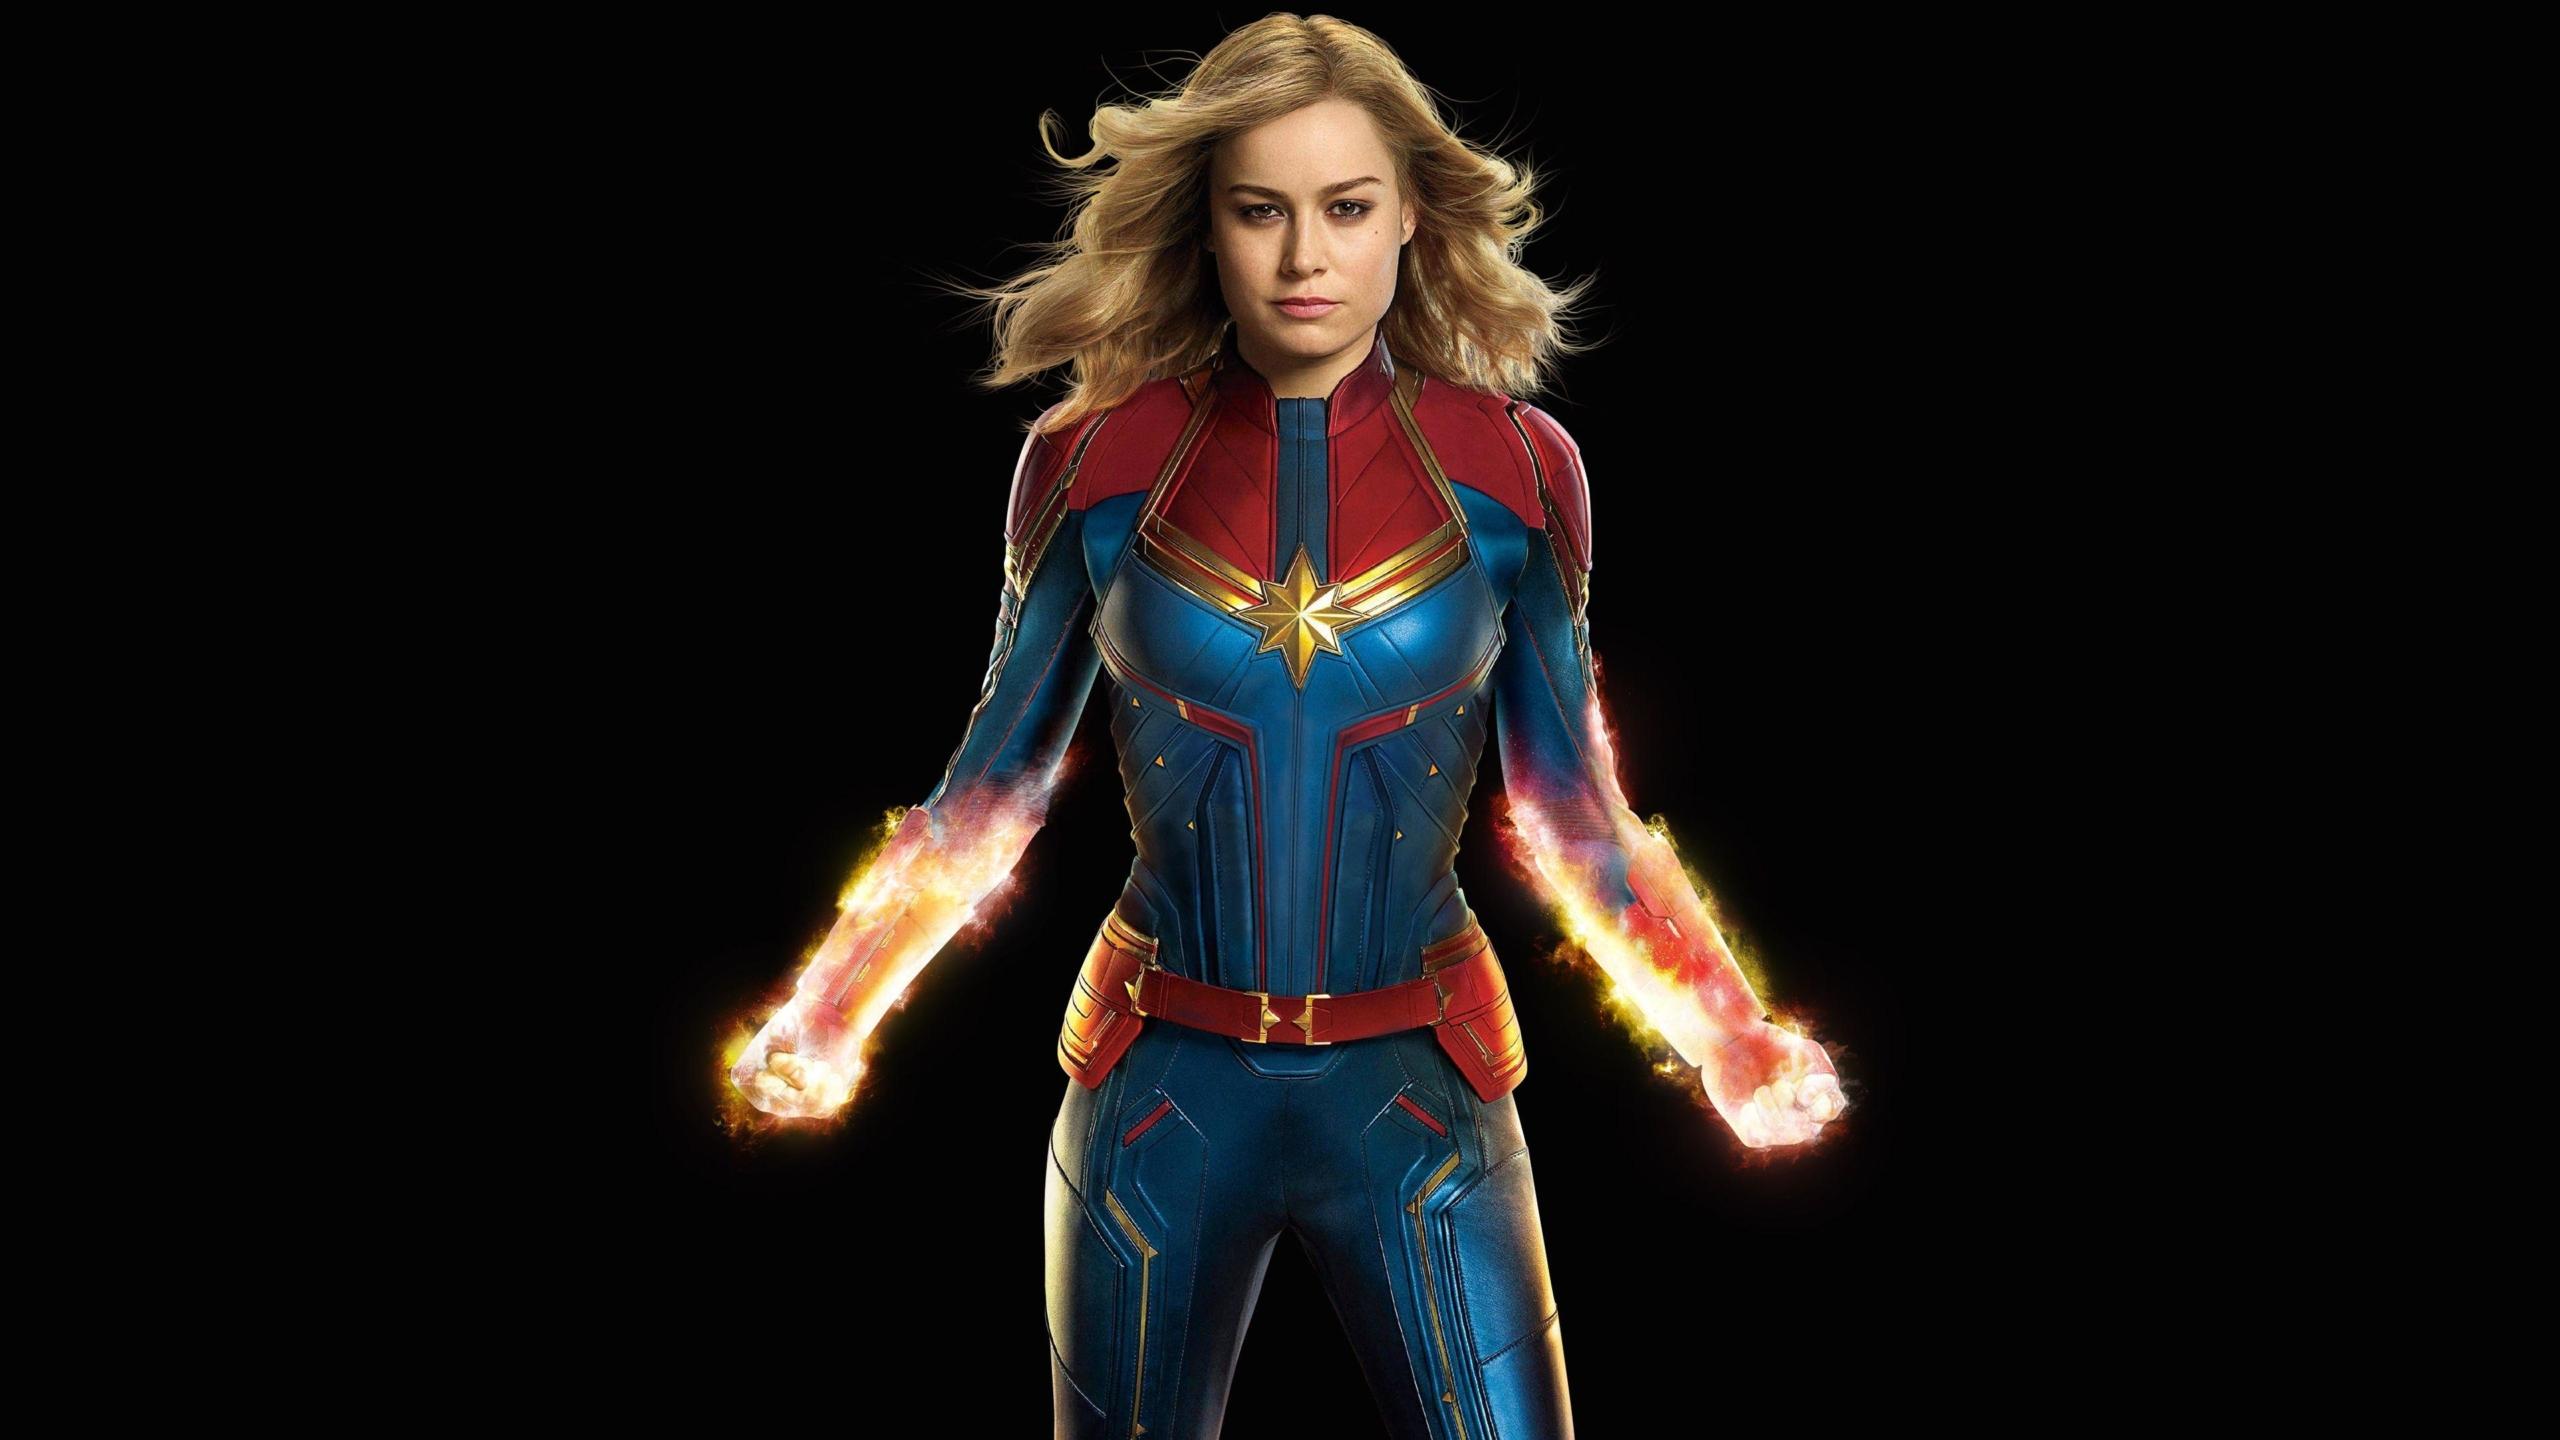 Captain Marvel wallpaper design ideas